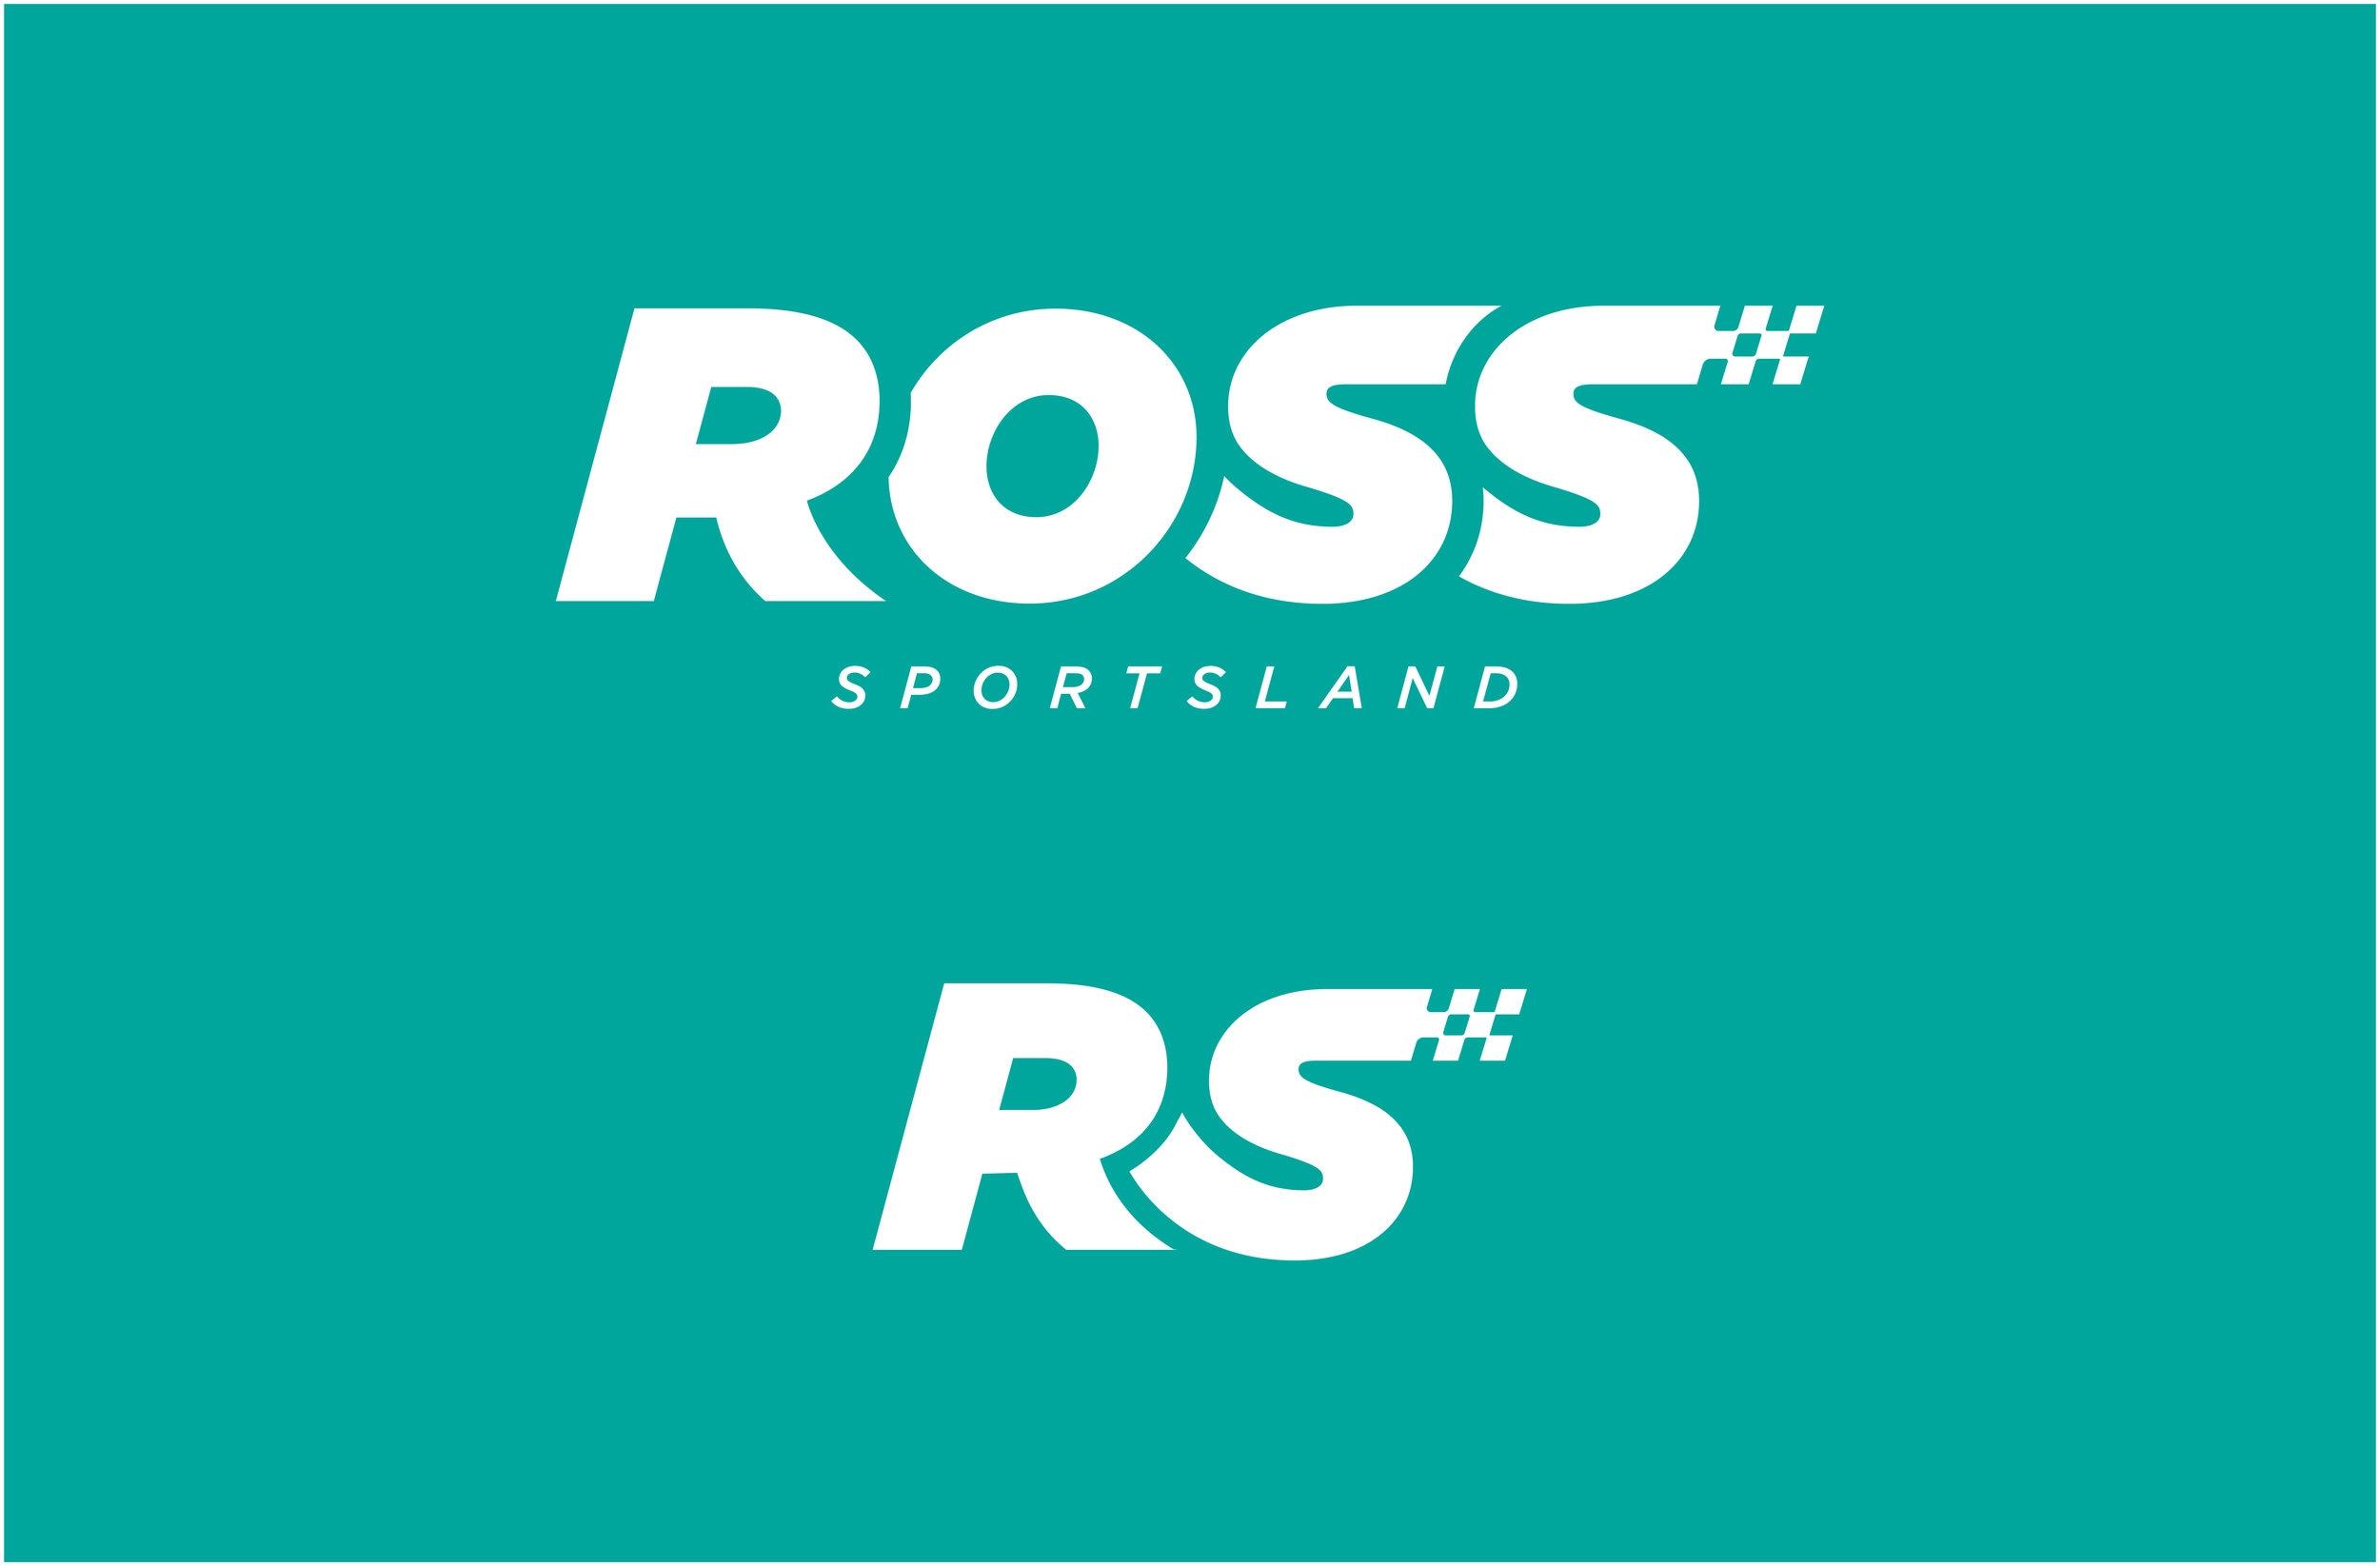 Ross's Sportsland